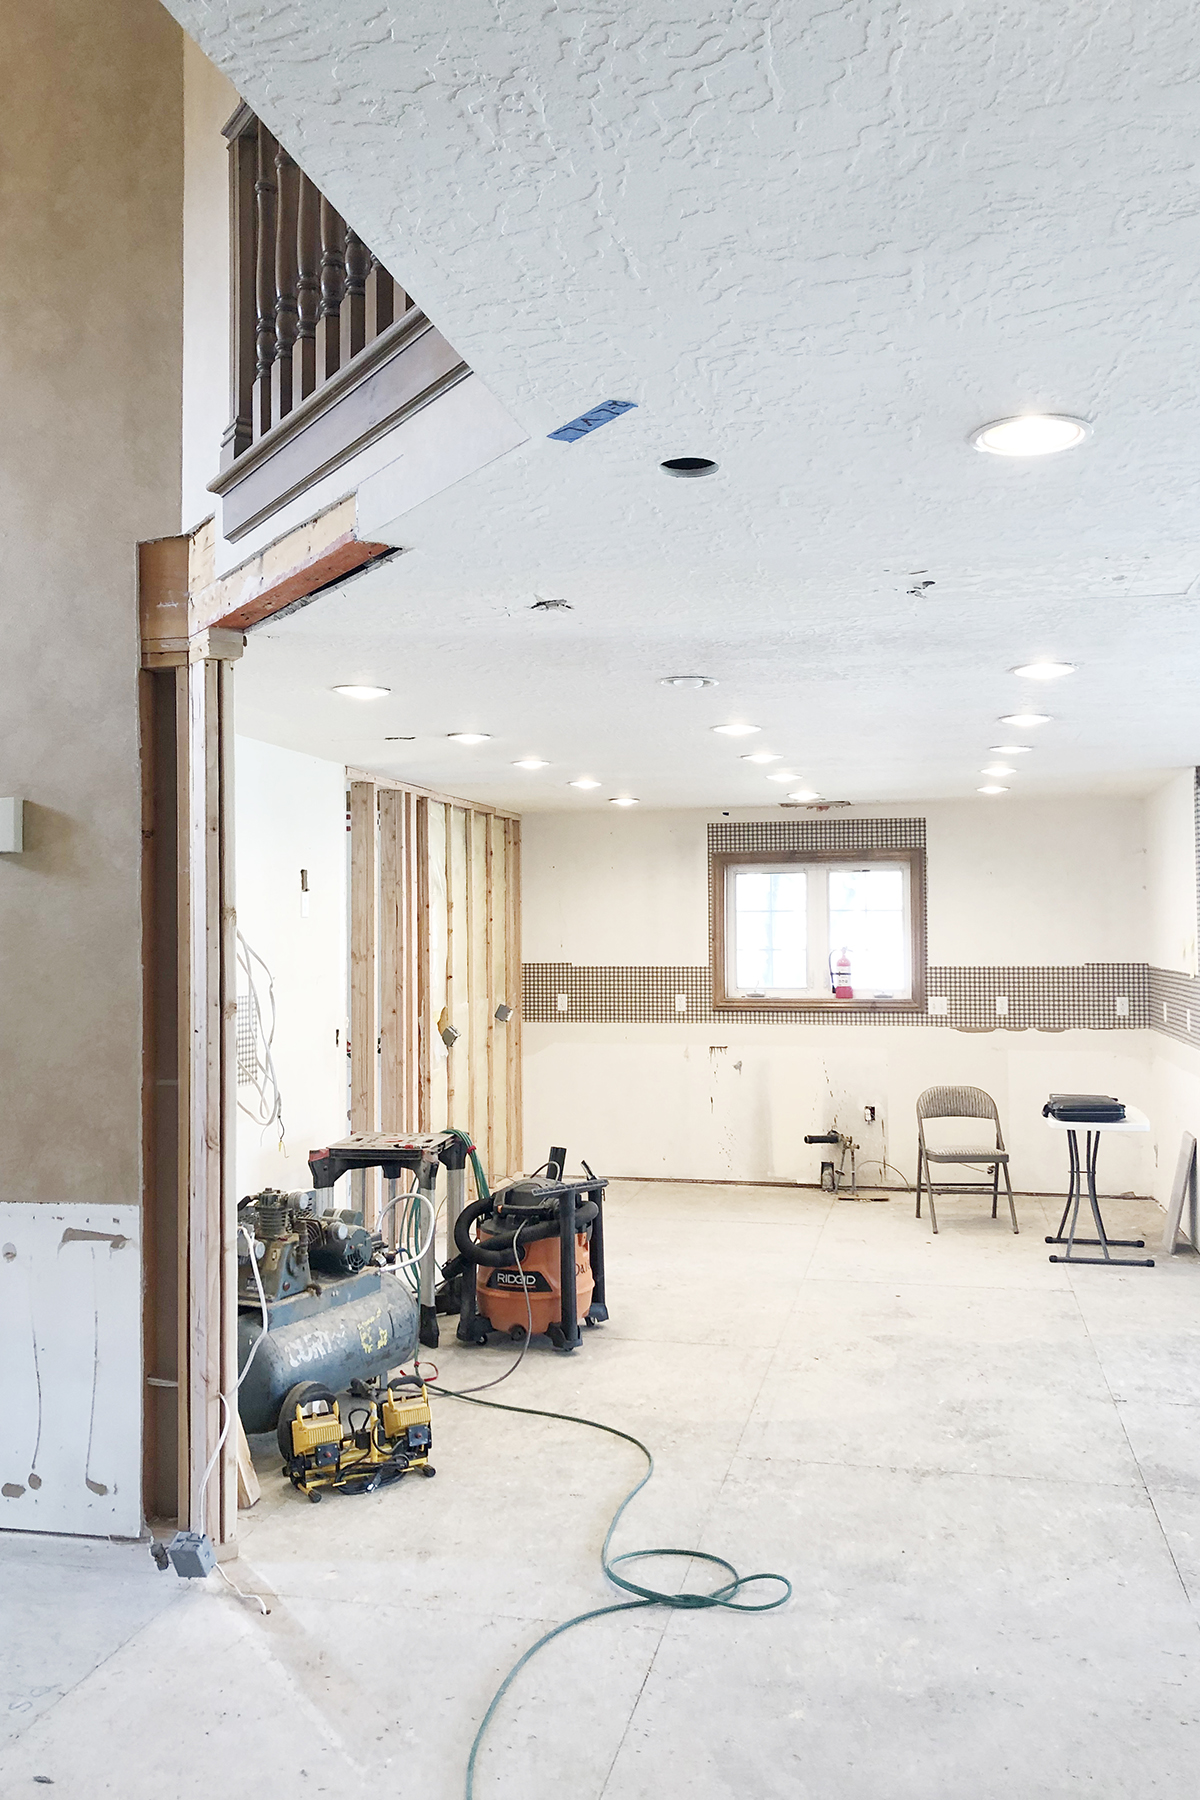 Kitchen wall 3